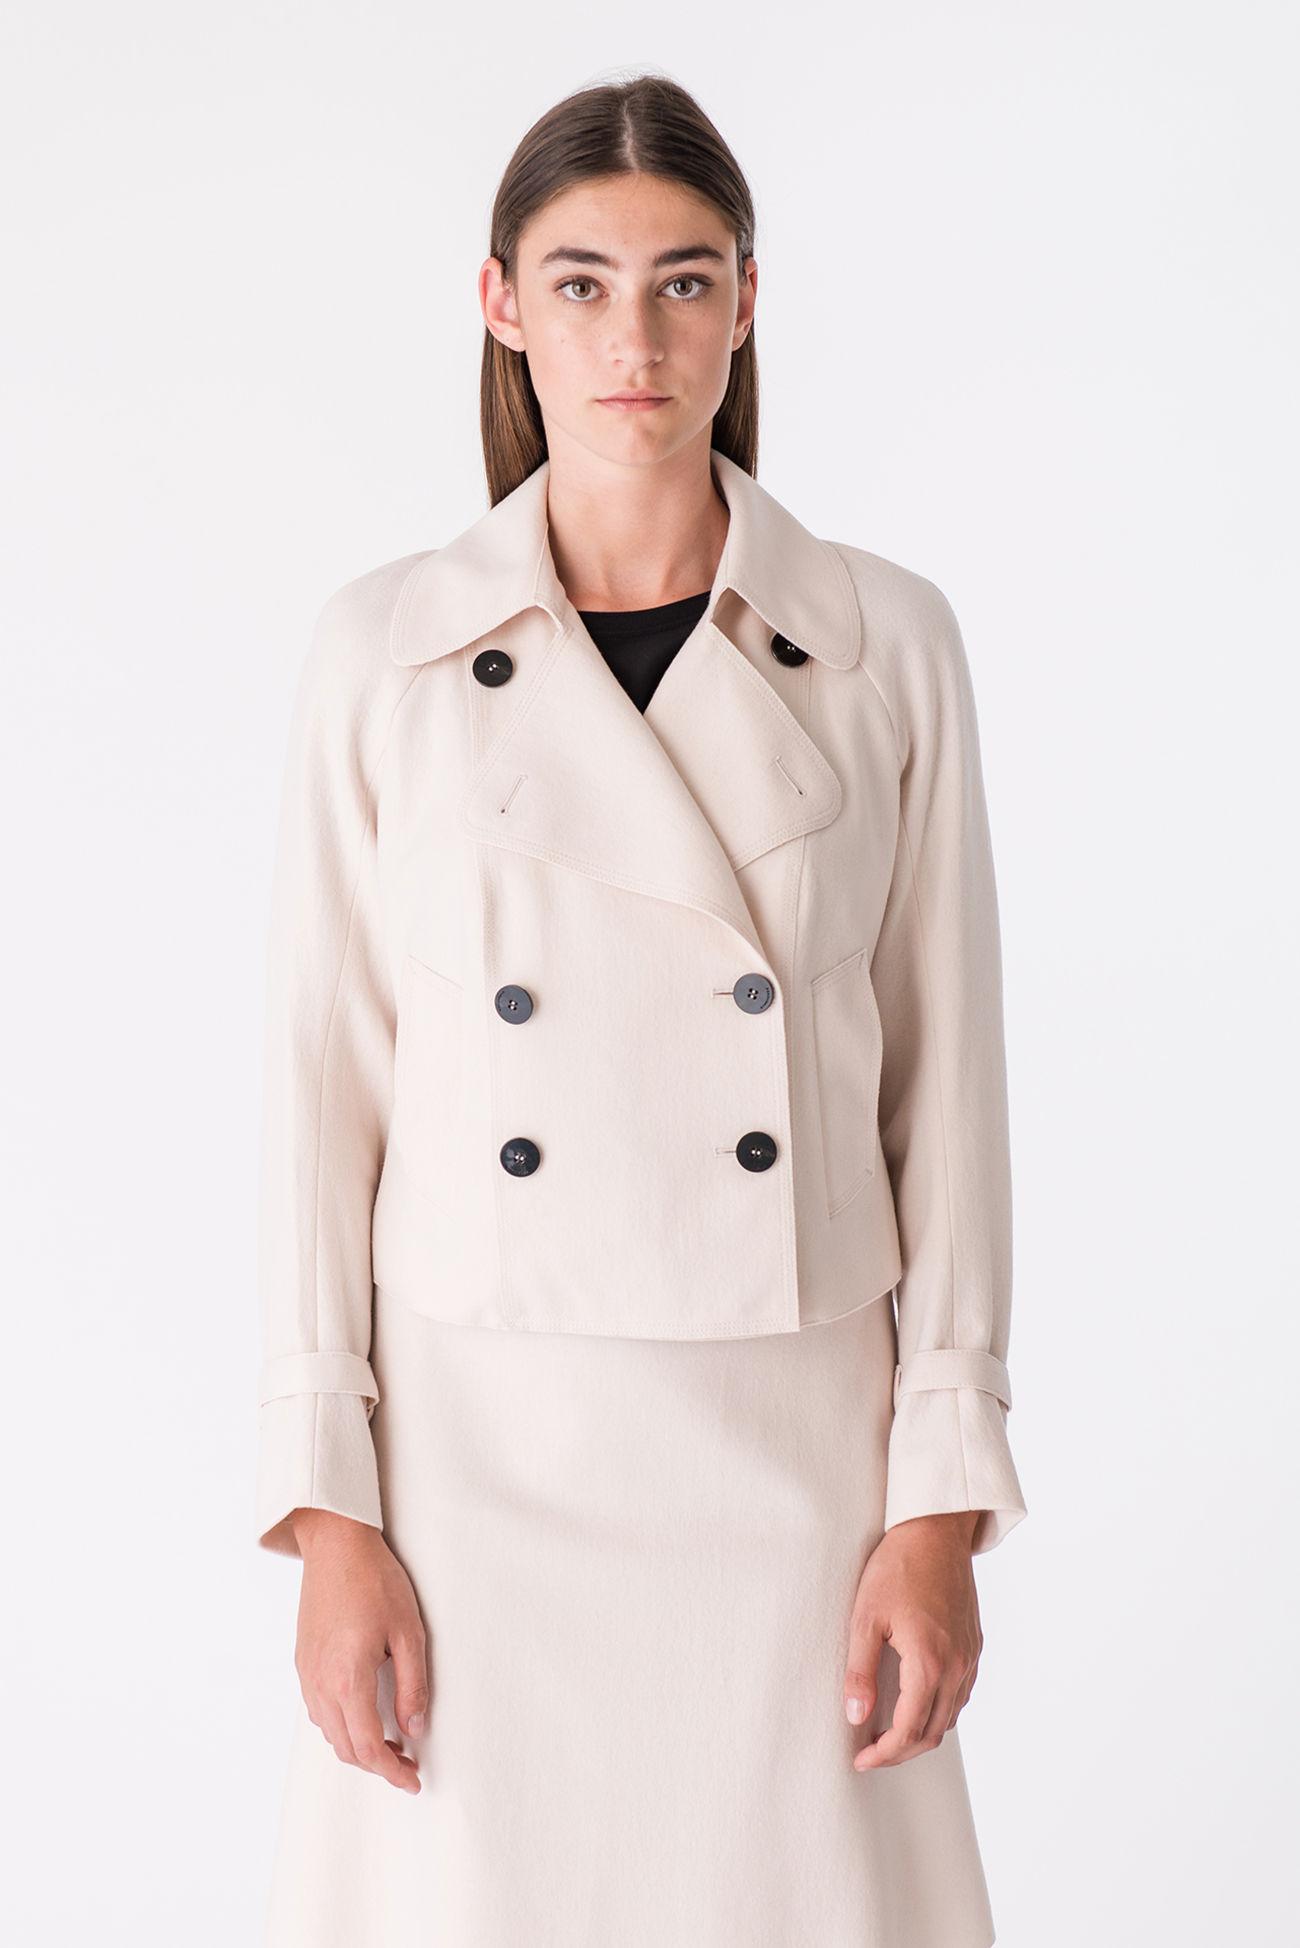 Waist-length wool jacket in a sailor style